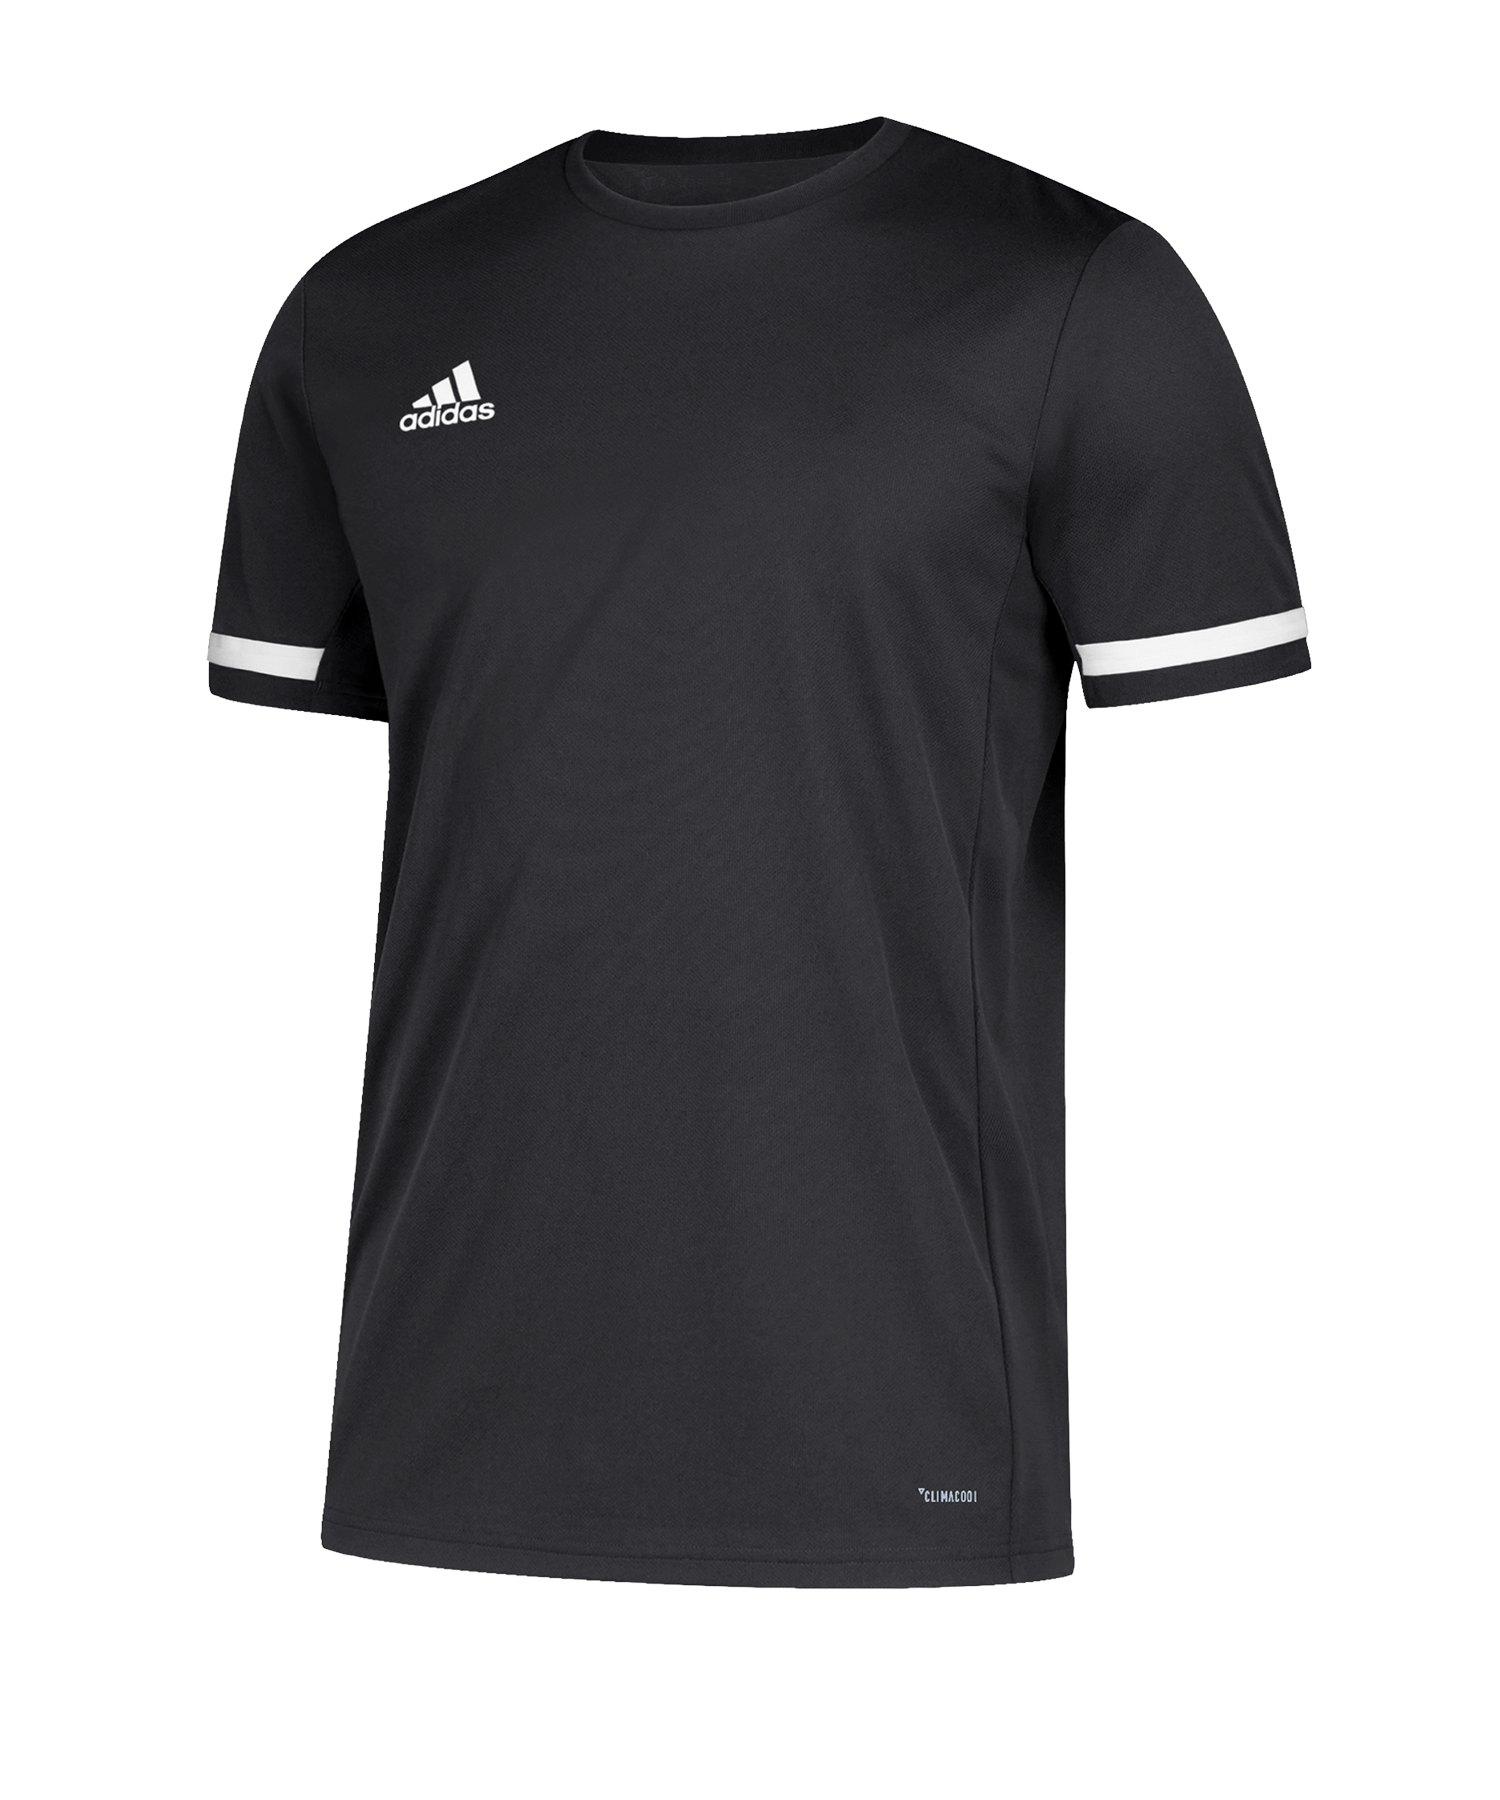 adidas Team 19 Trikot kurzarm Schwarz Weiss - schwarz